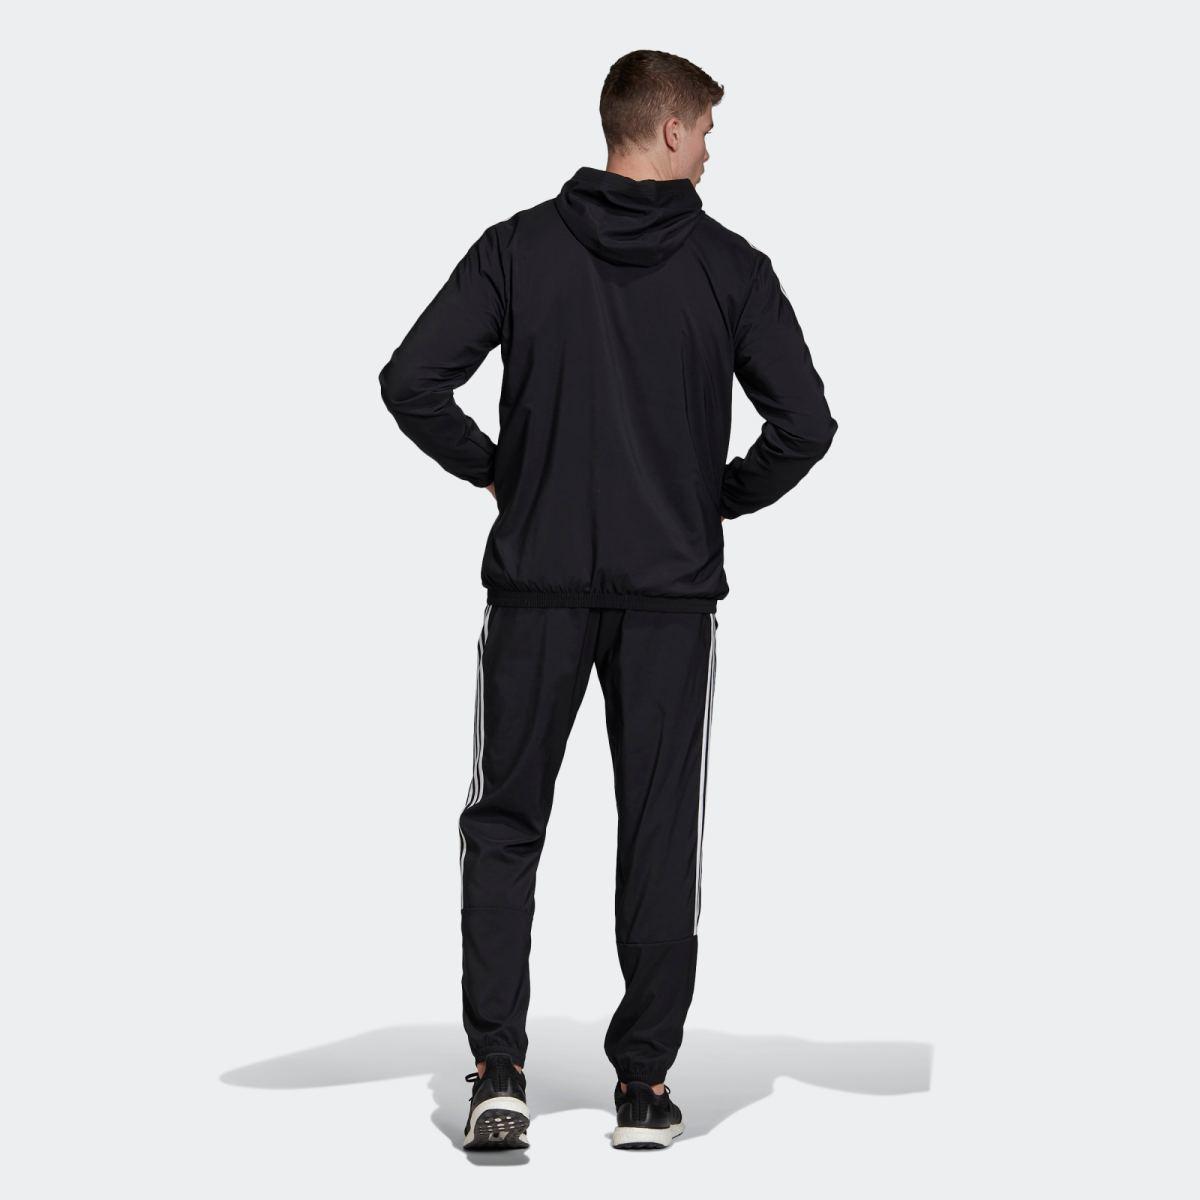 Track_Suit_Black_EB7651_23_hover_model